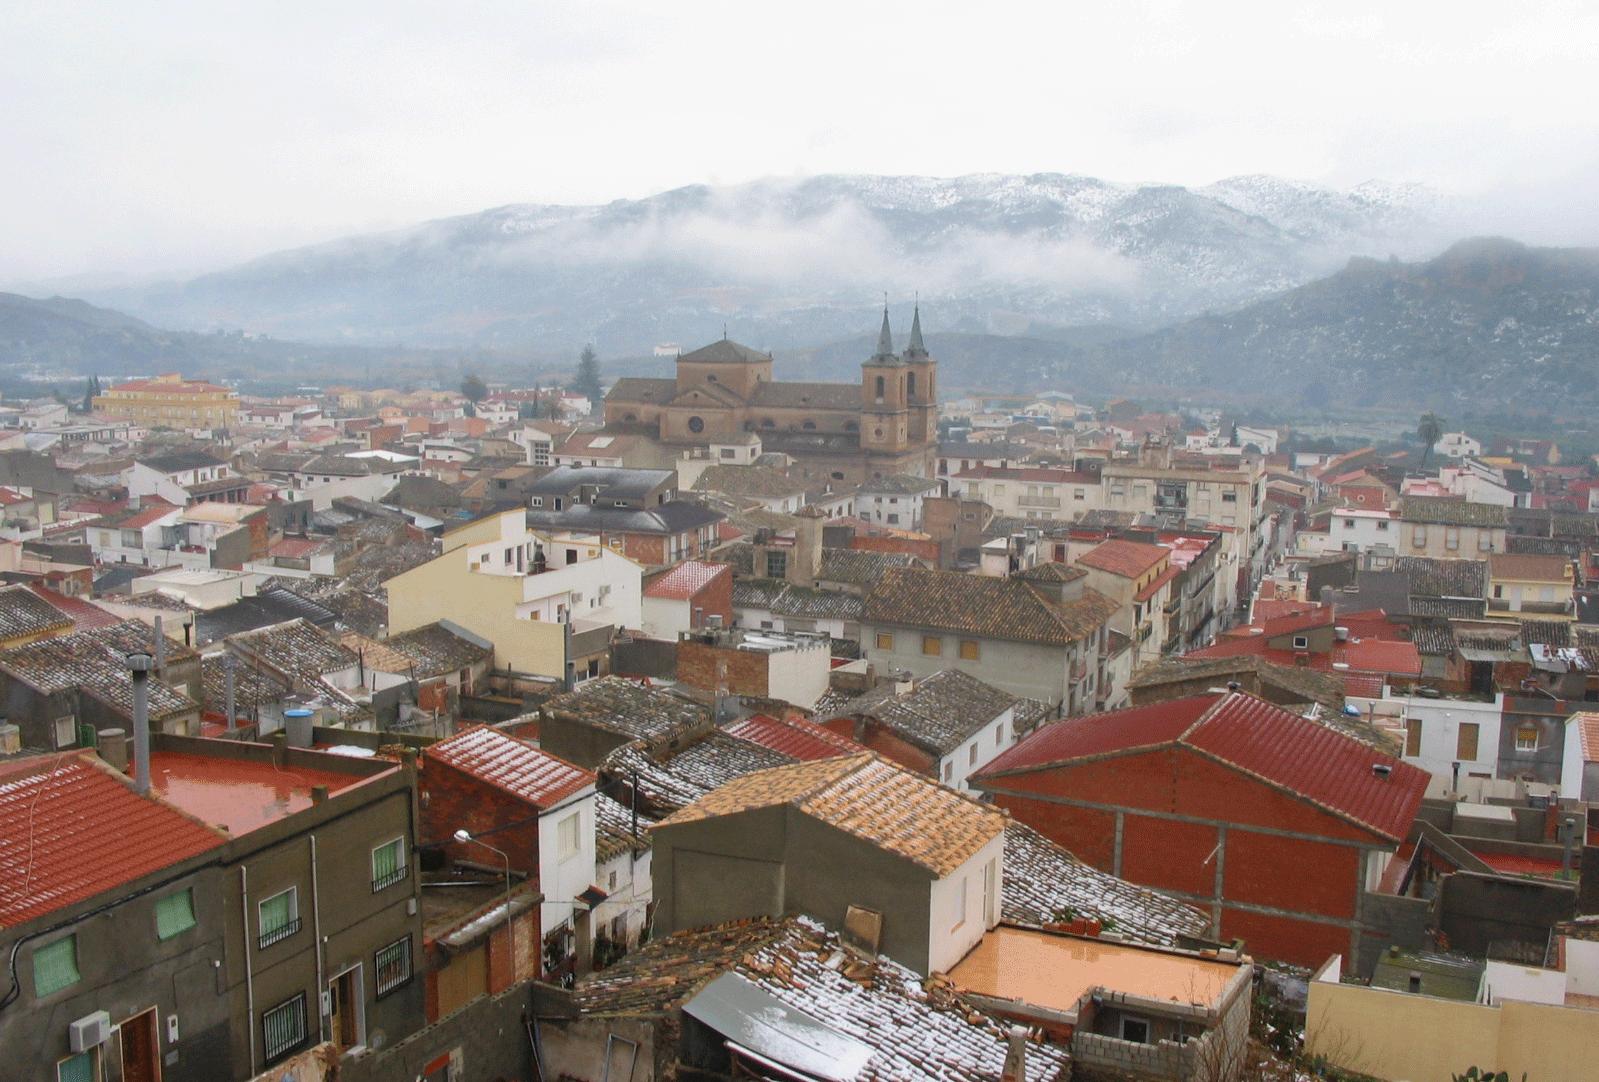 Vista de Cantoria